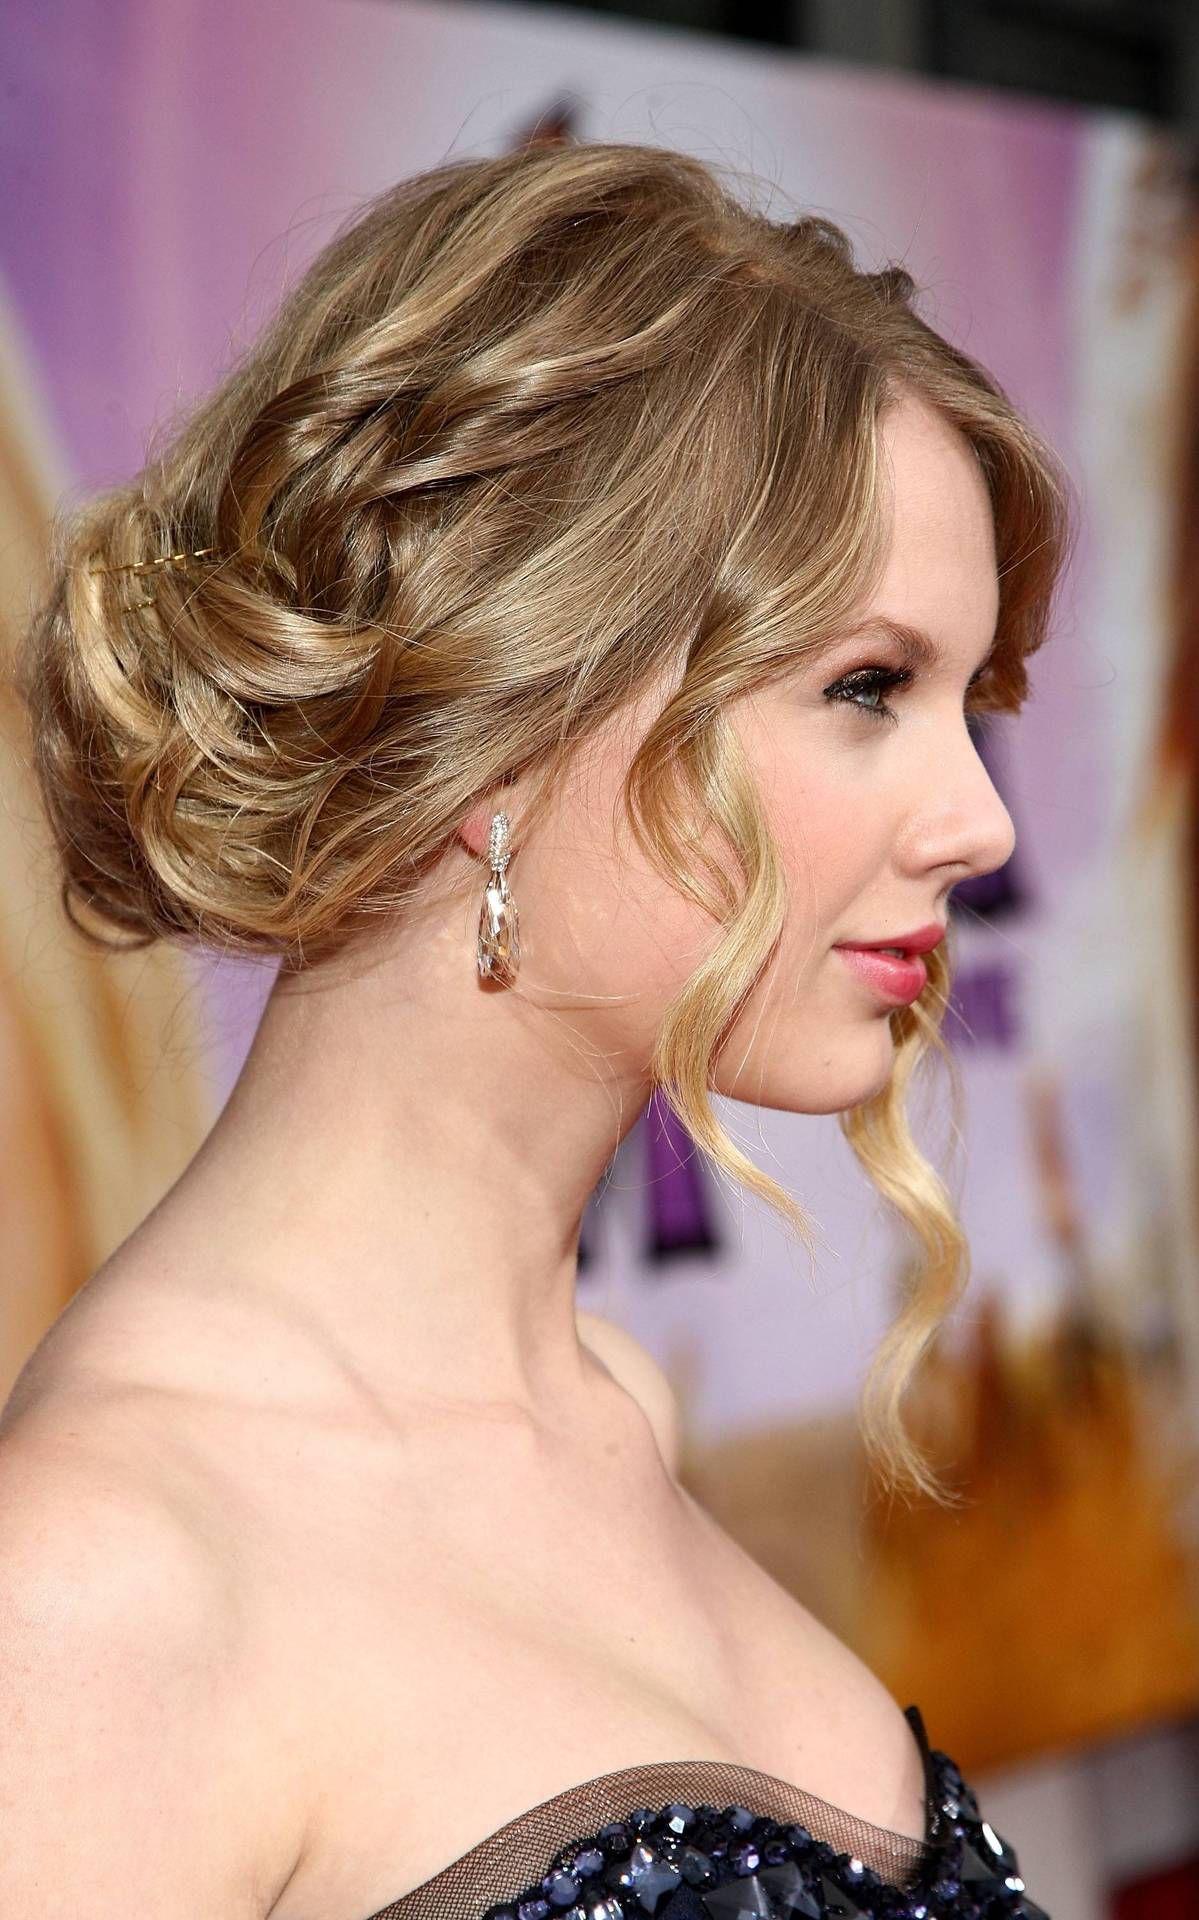 Taylor Swift Loose Bun Updo Sooooo gotta do this hairstyle